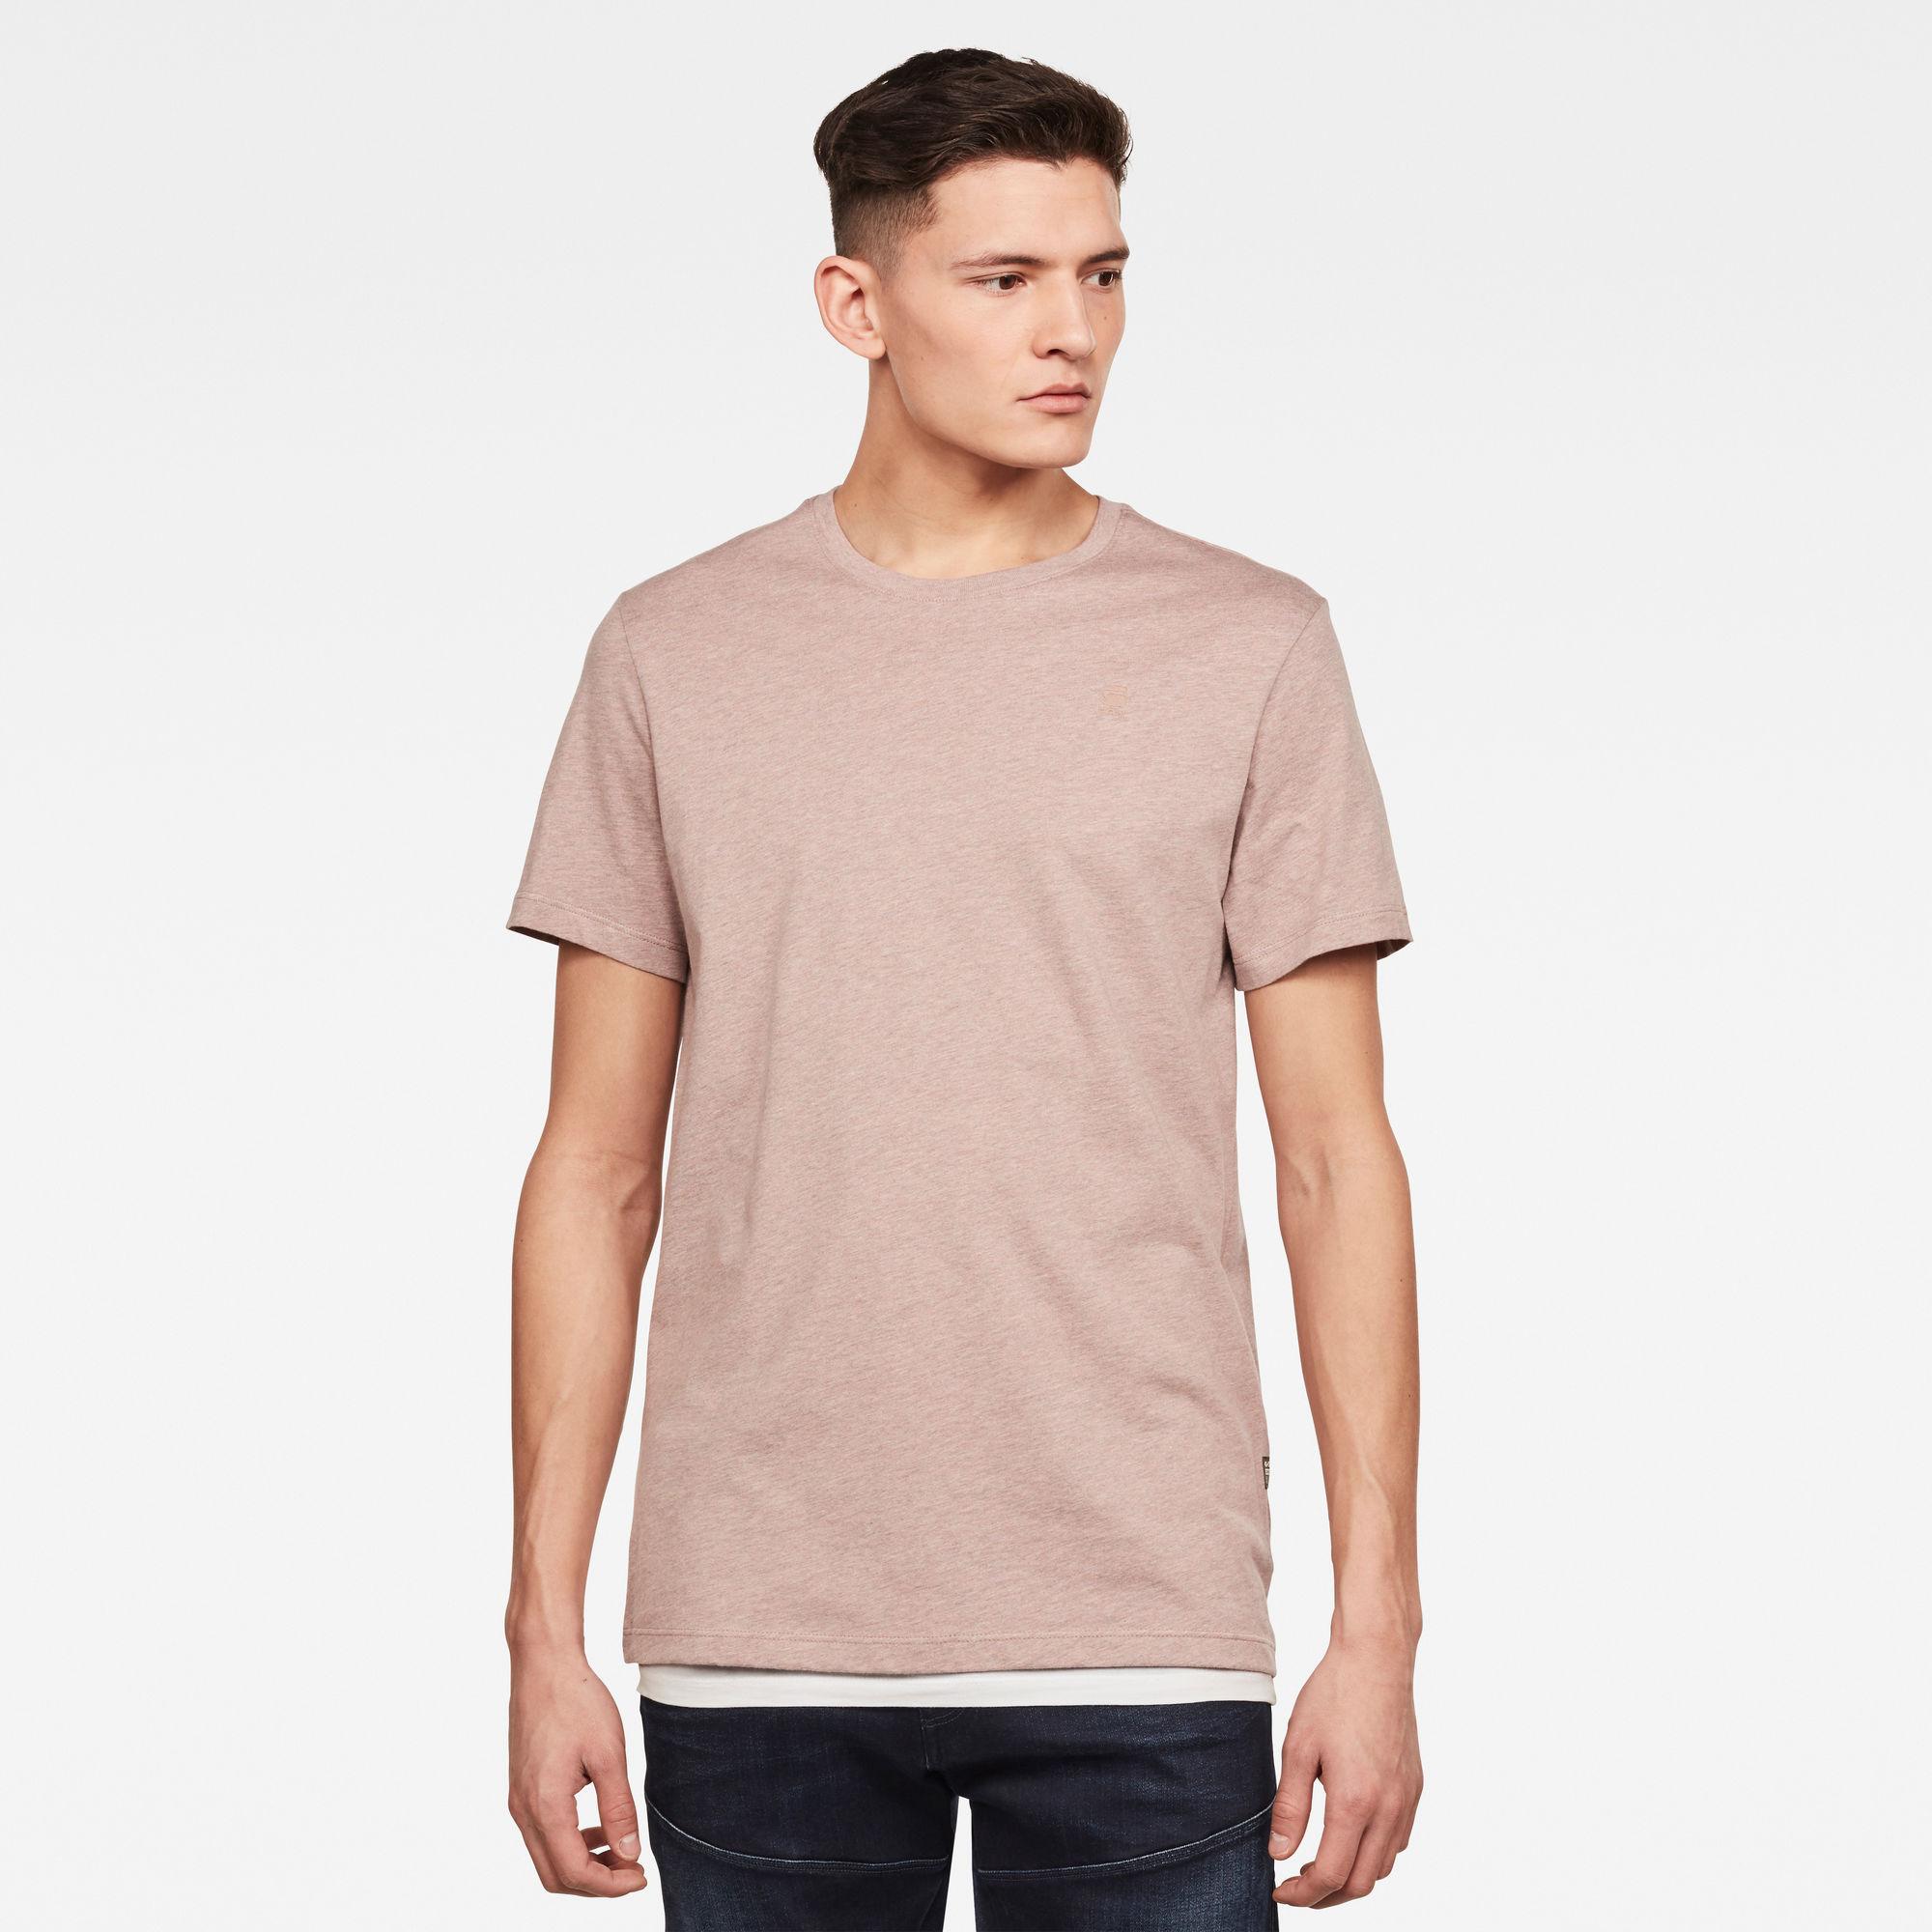 G-Star RAW Heren Base-S T-Shirt Bruin